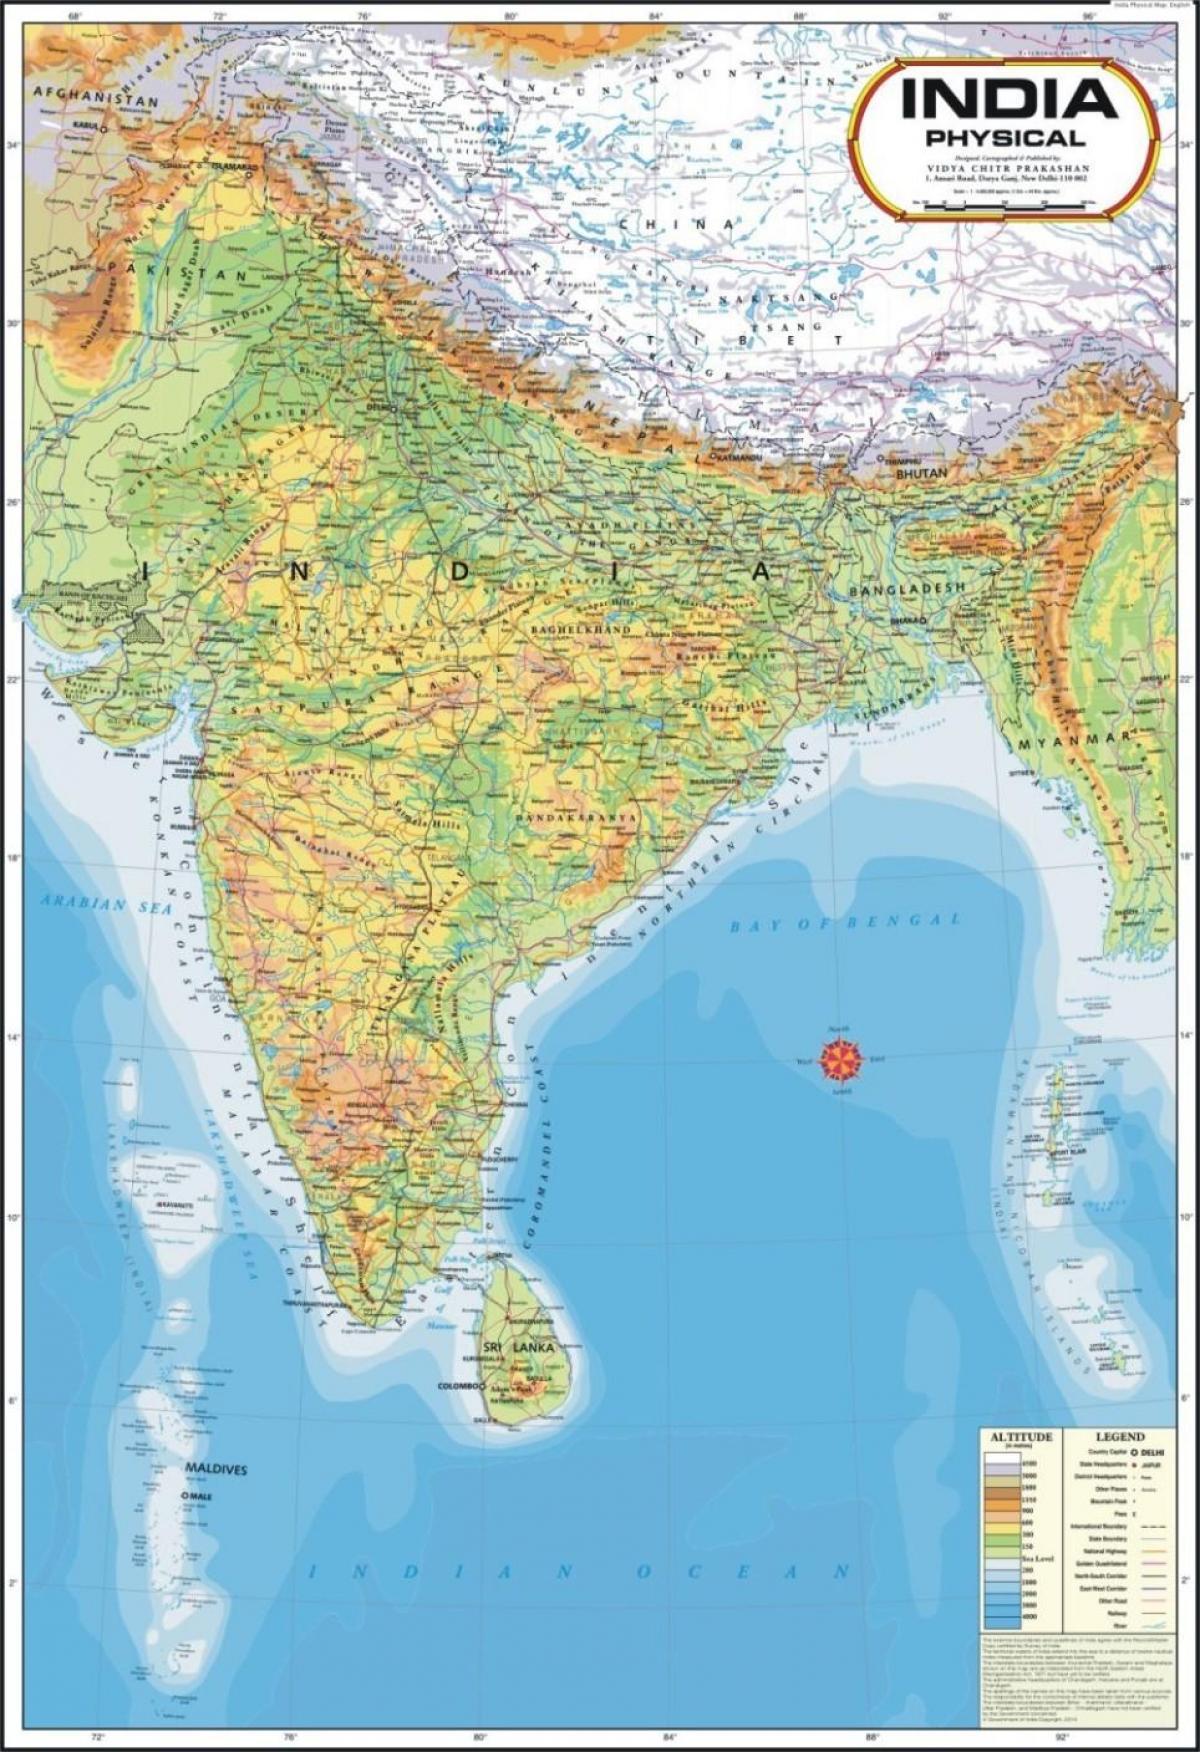 Cartina India.Peta Fisik Dari India India Peta Fisik Asia Selatan Asia